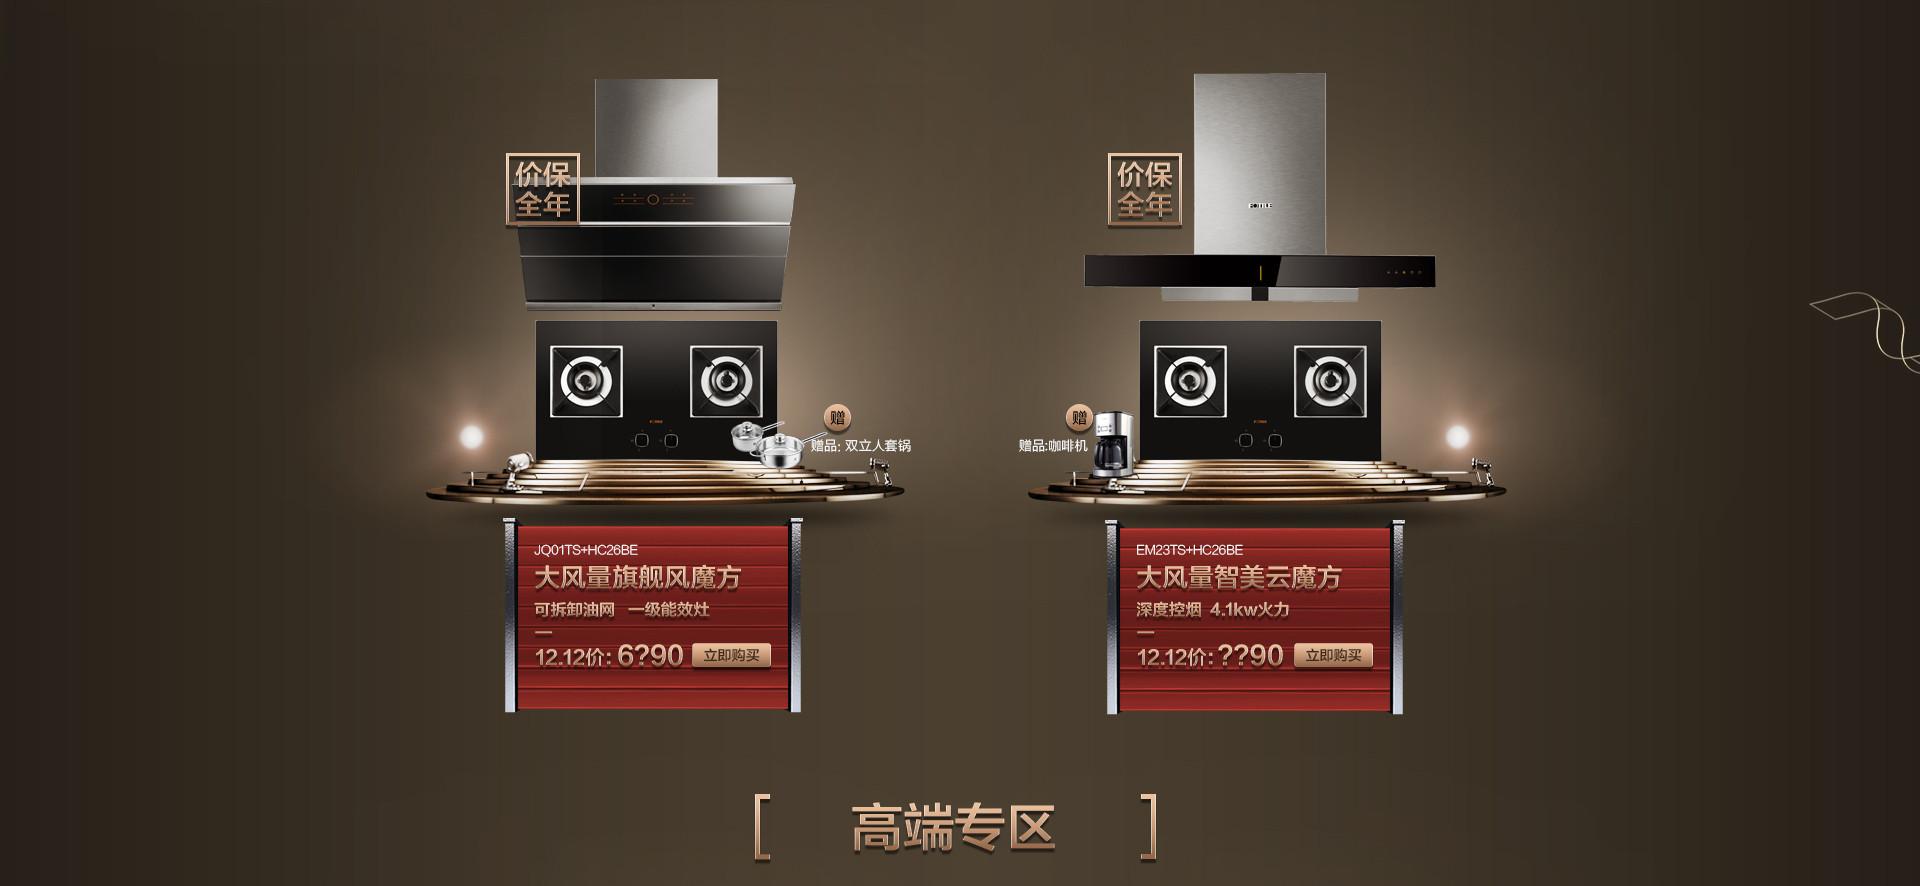 http://image.suning.cn/uimg/sop/commodity/123189497227842394460010_x.jpg